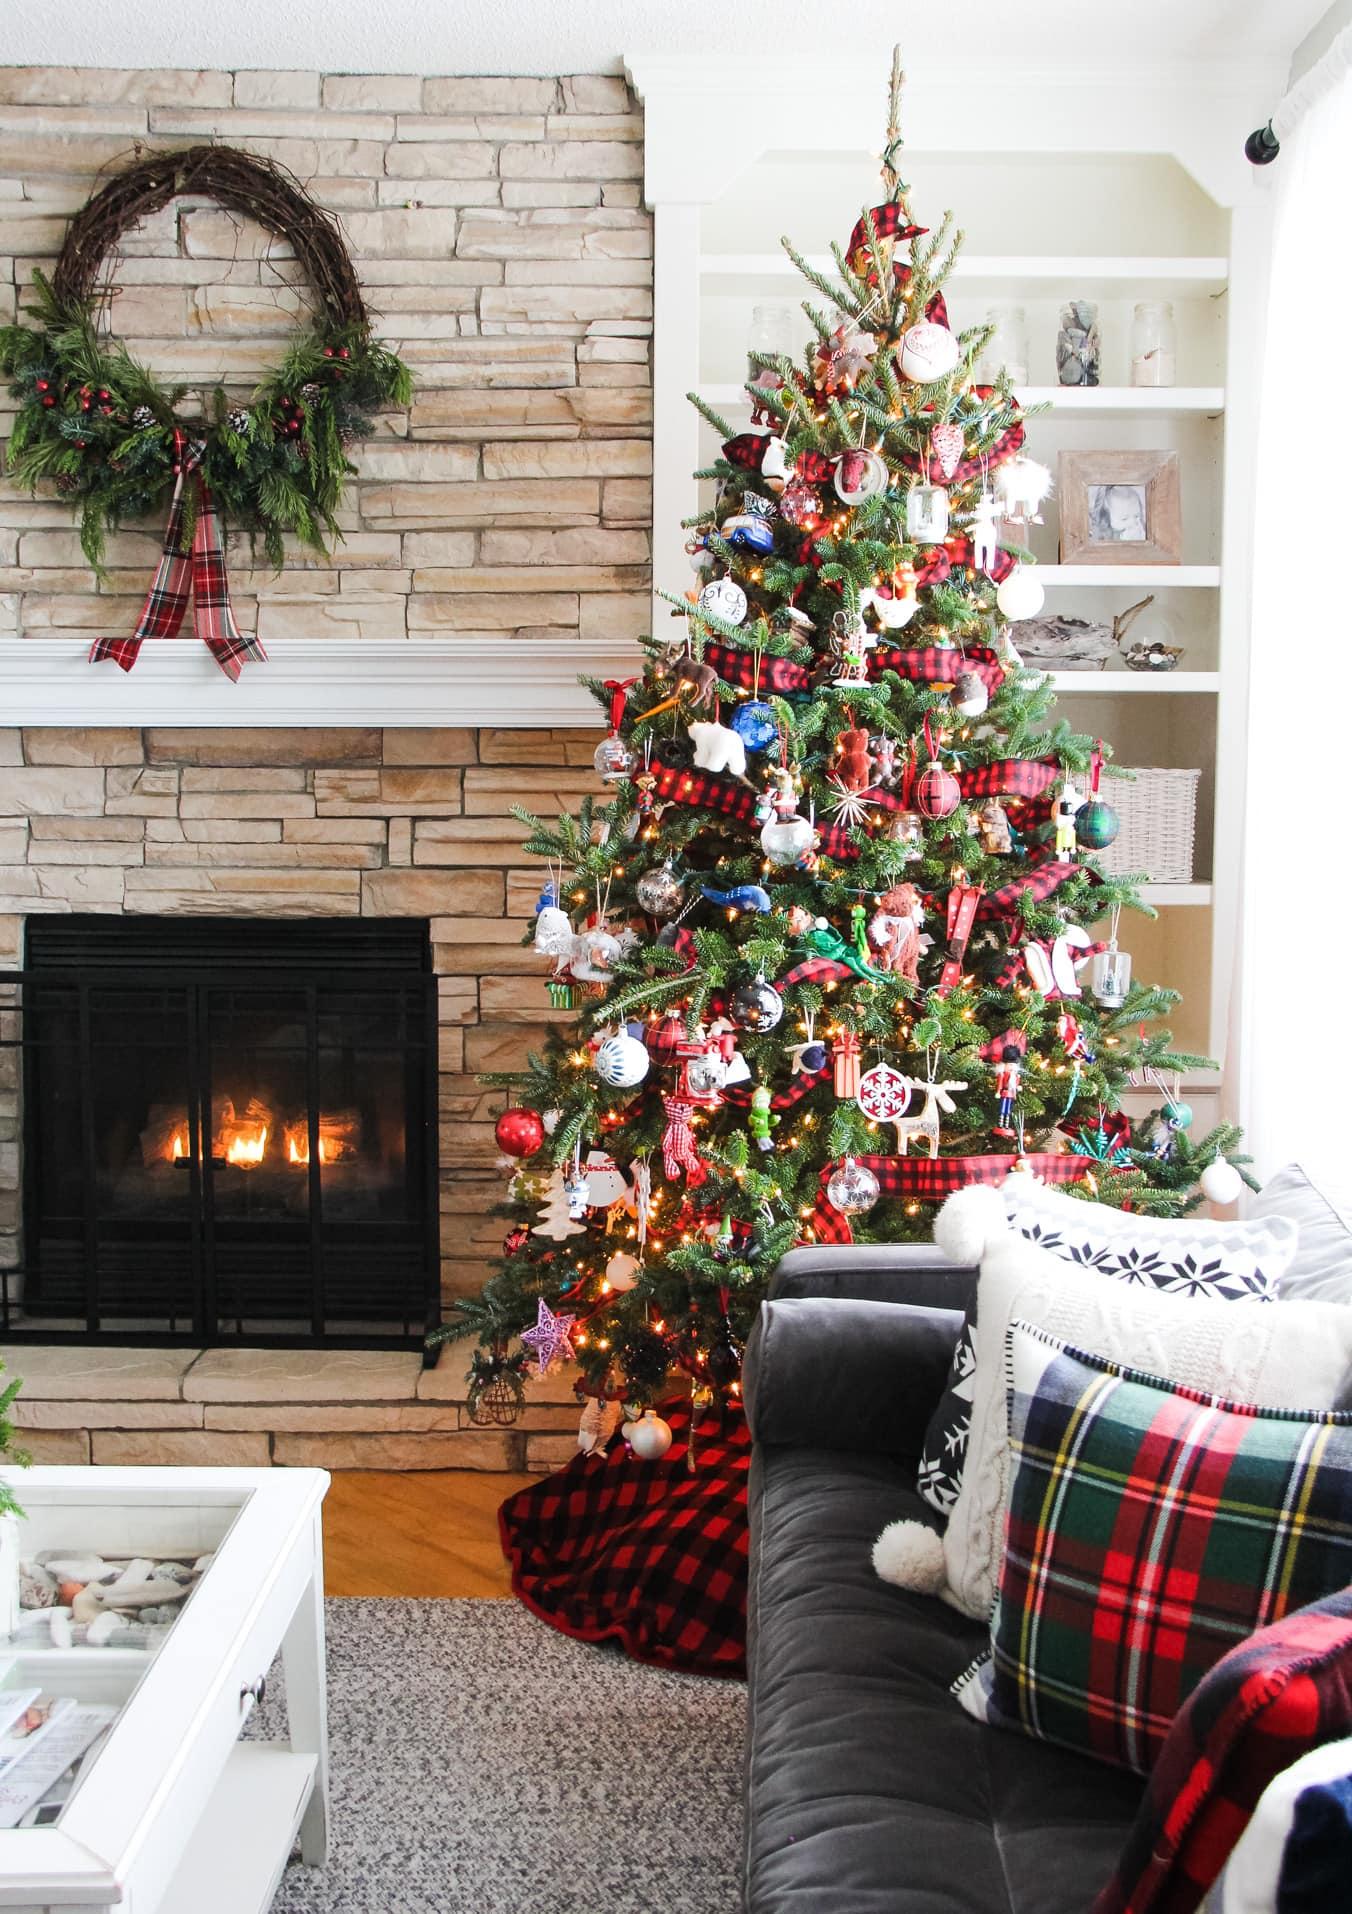 A pretty plaid themed living room for Christmas